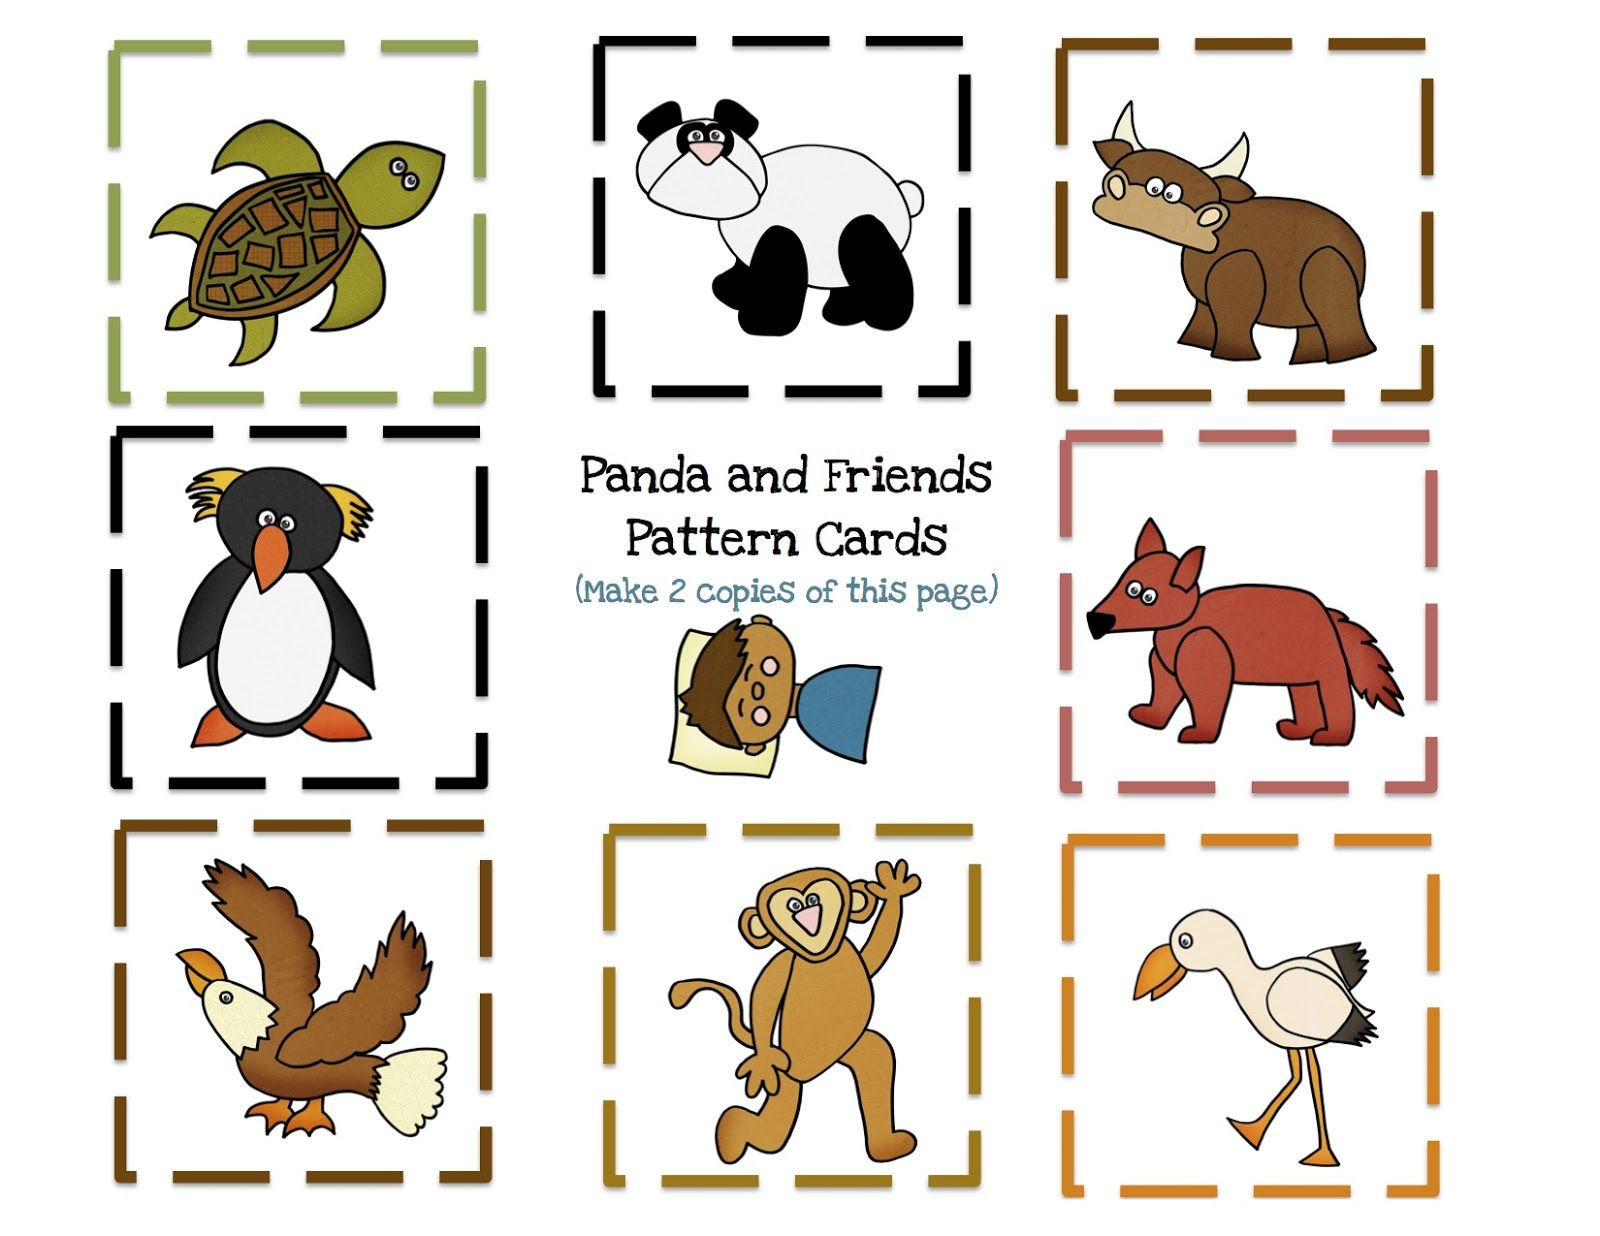 Panda Friends 8 Pattern Cards Template 1 600 1 236